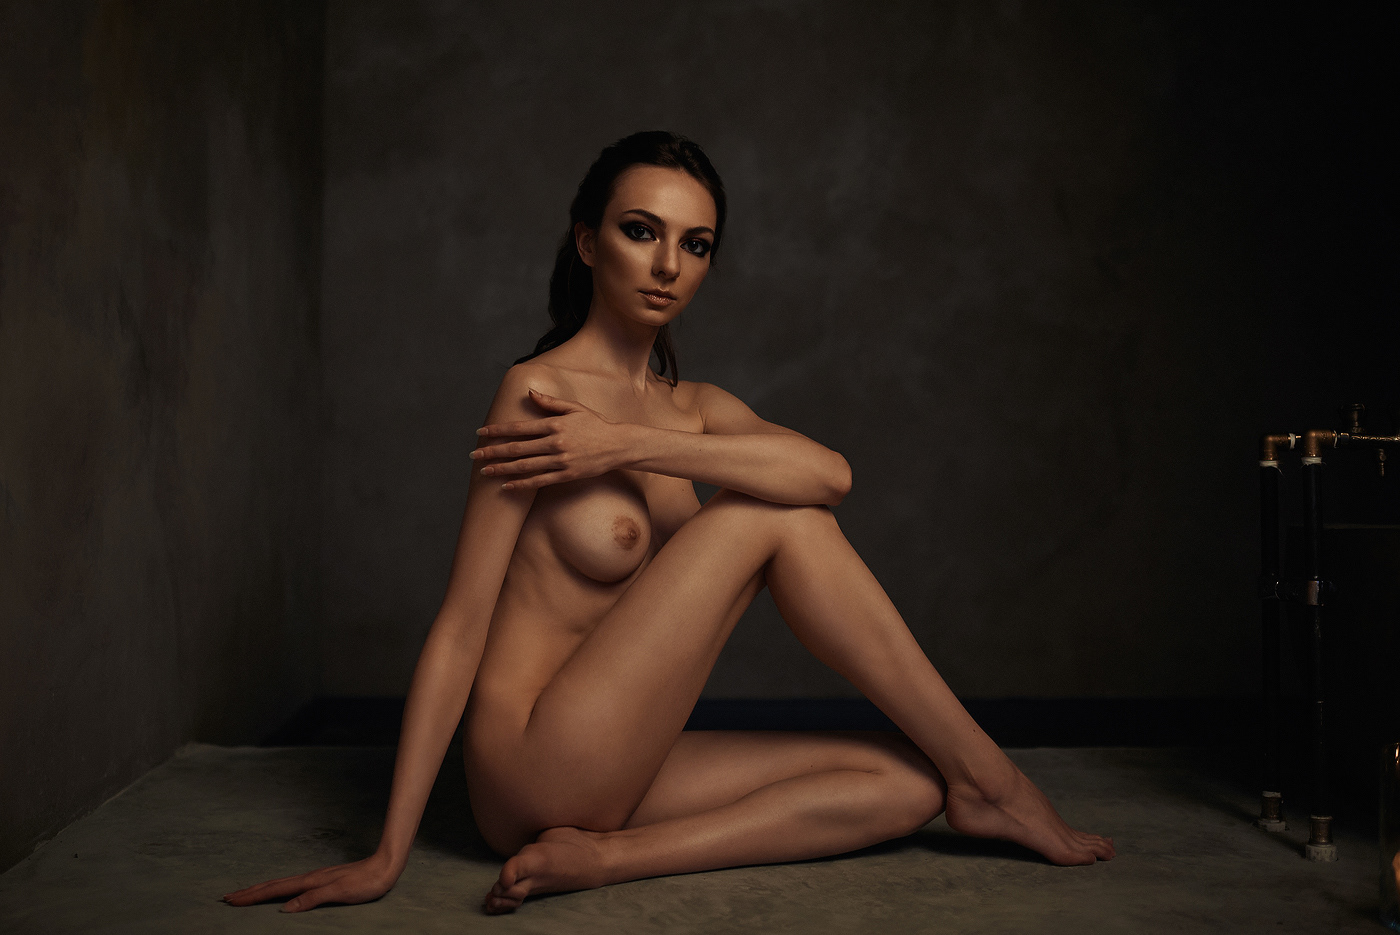 Margo Amp - Dmitry Bugaenko photoshoot